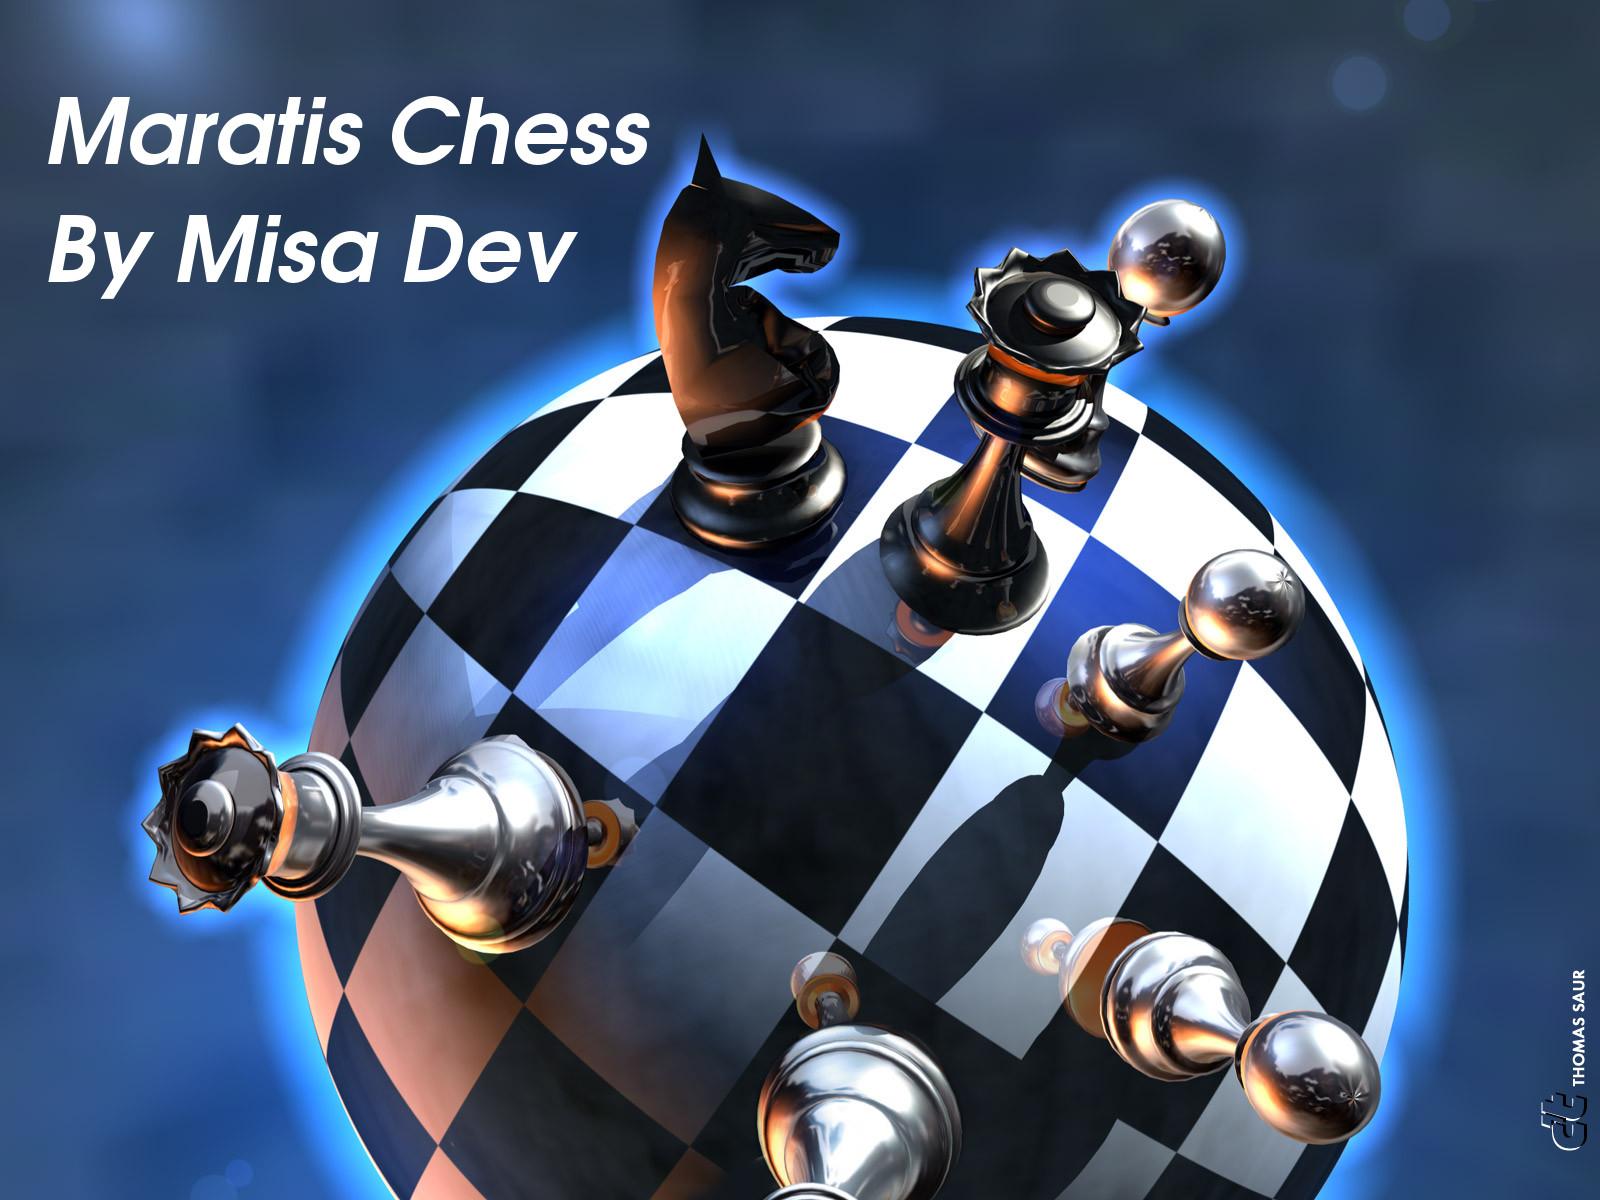 http://www.misadev.com/p/maratisChess/screens/chess.jpg